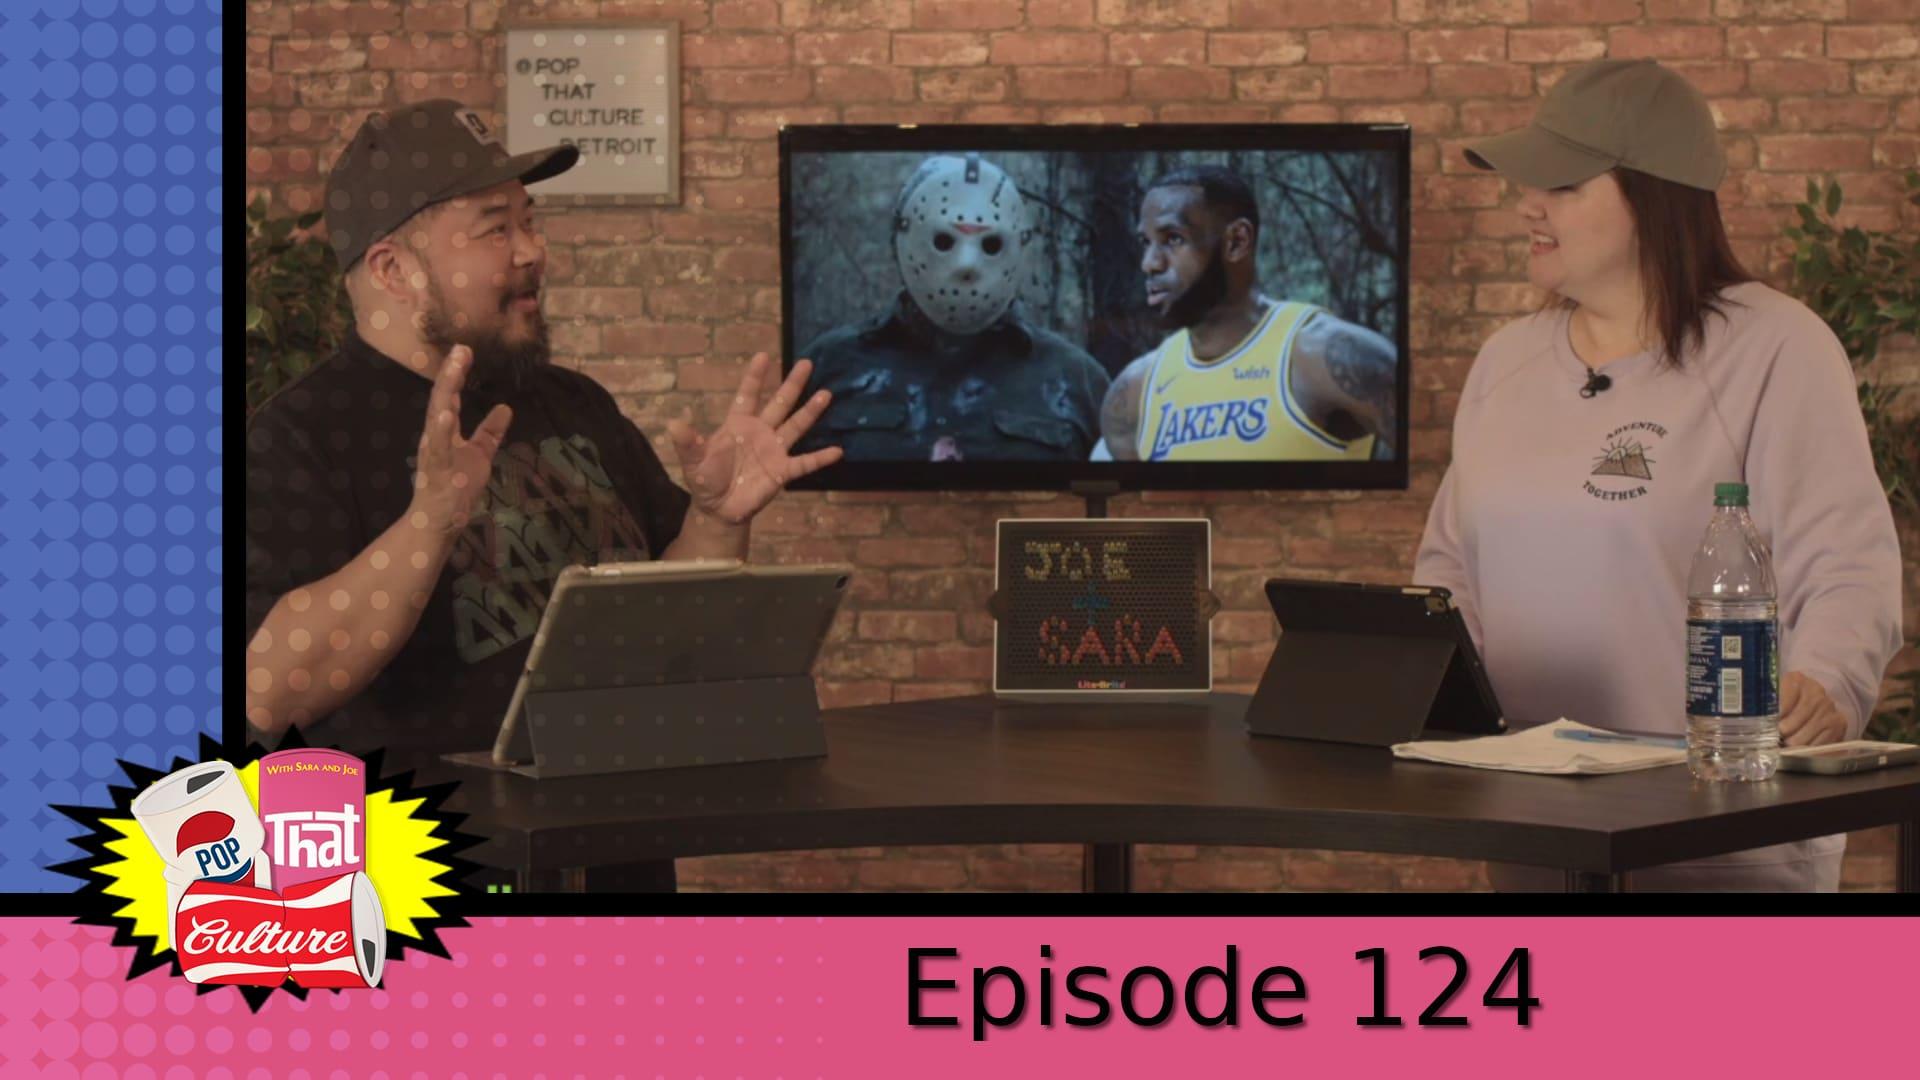 Pop That Culture - Episode 124